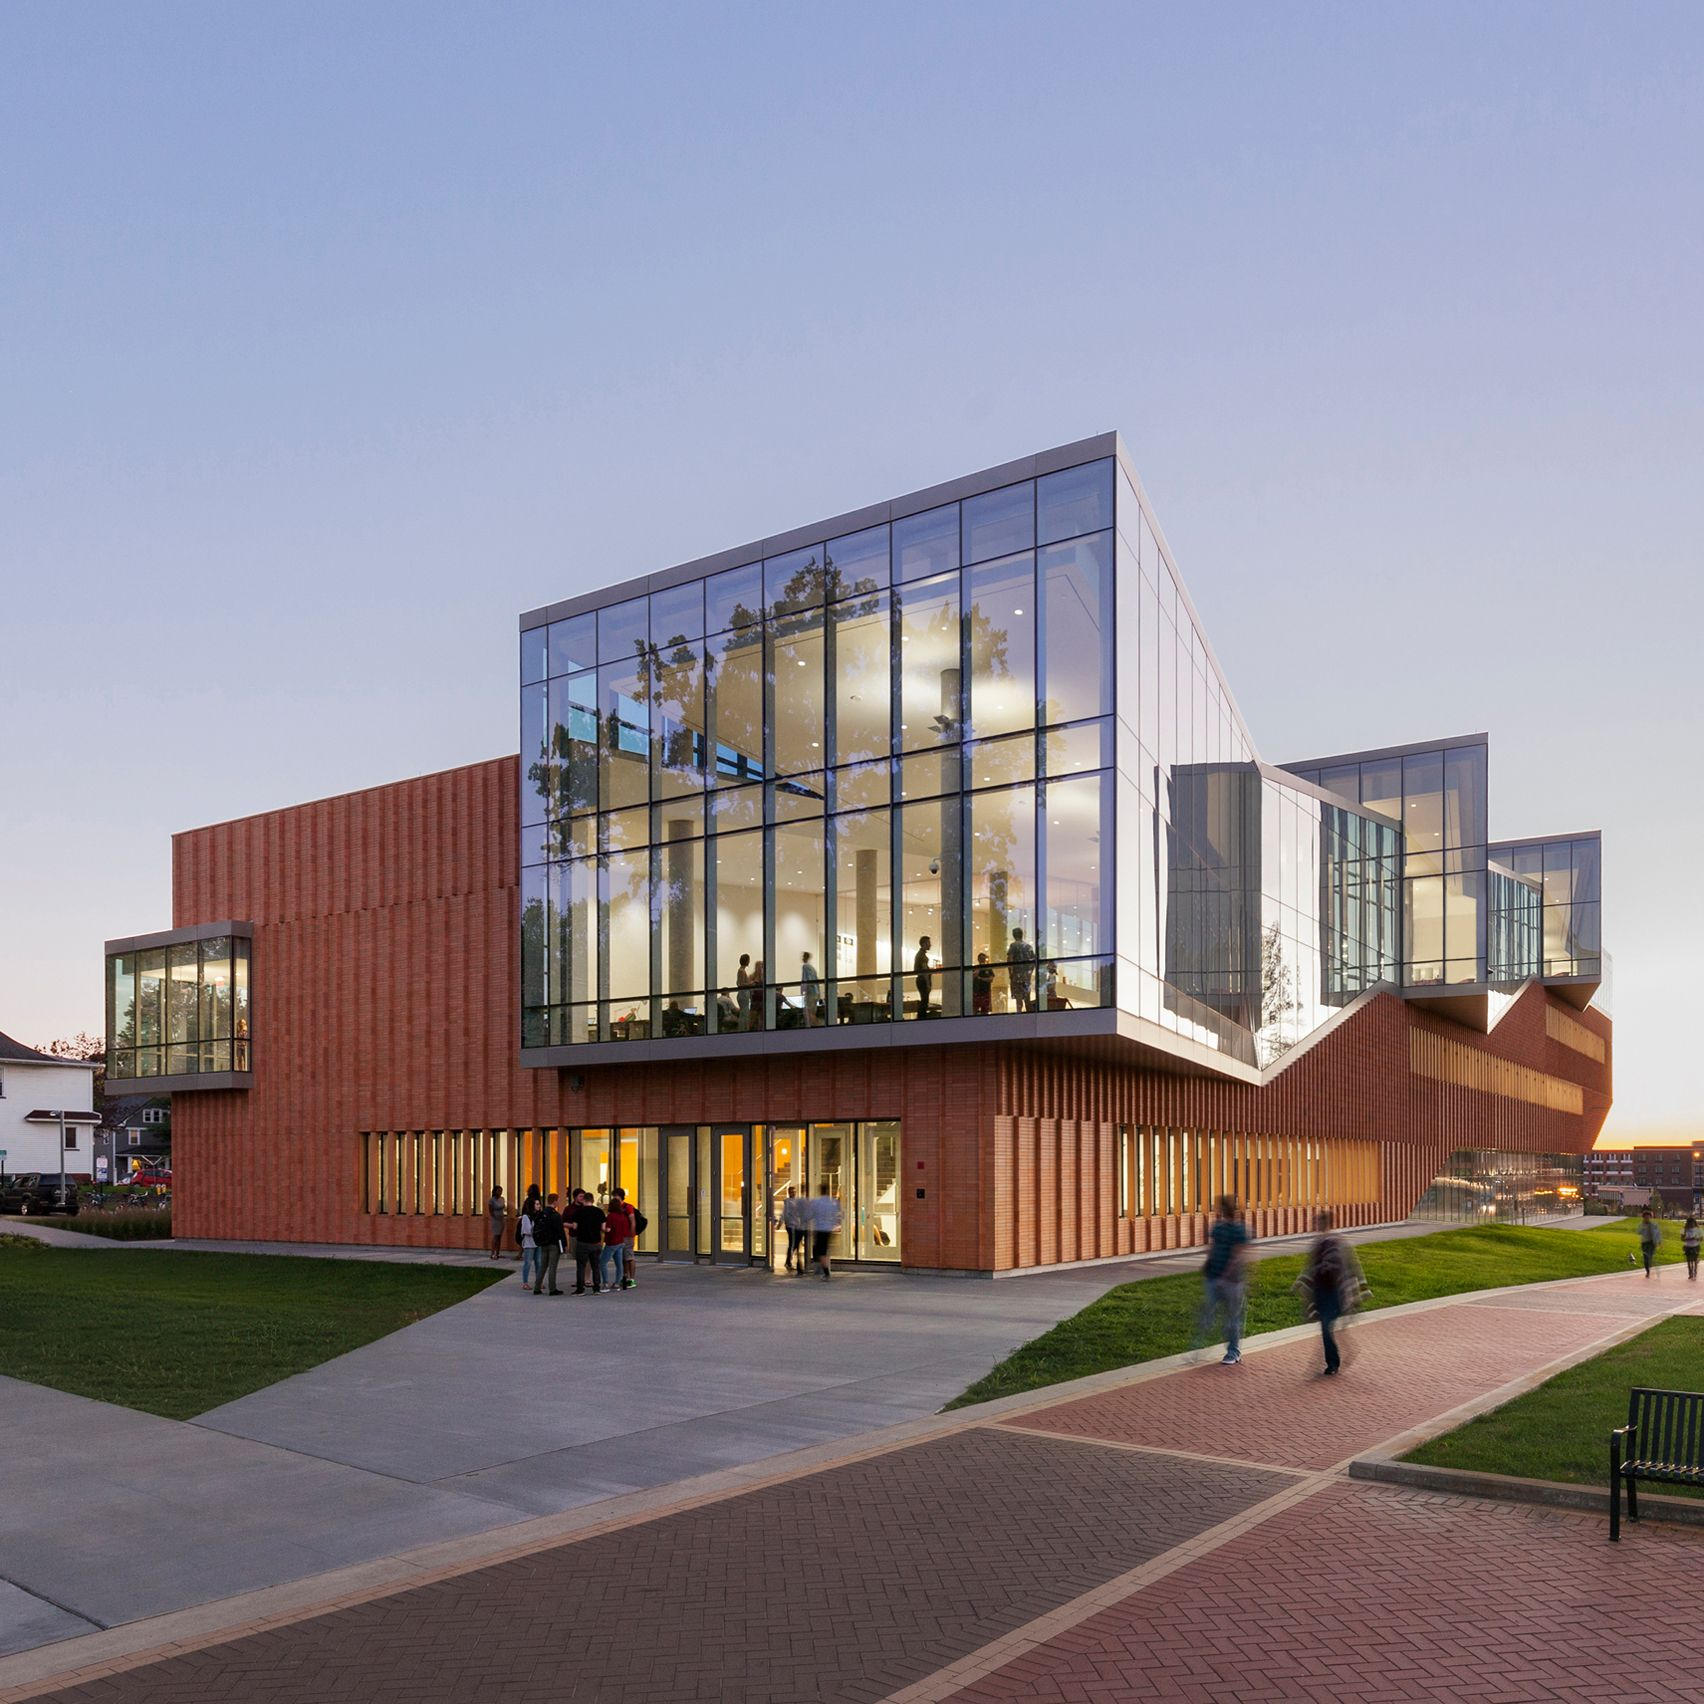 Utah Home Design Architects: American Studio Weiss Manfredi Used Glass, Brick And